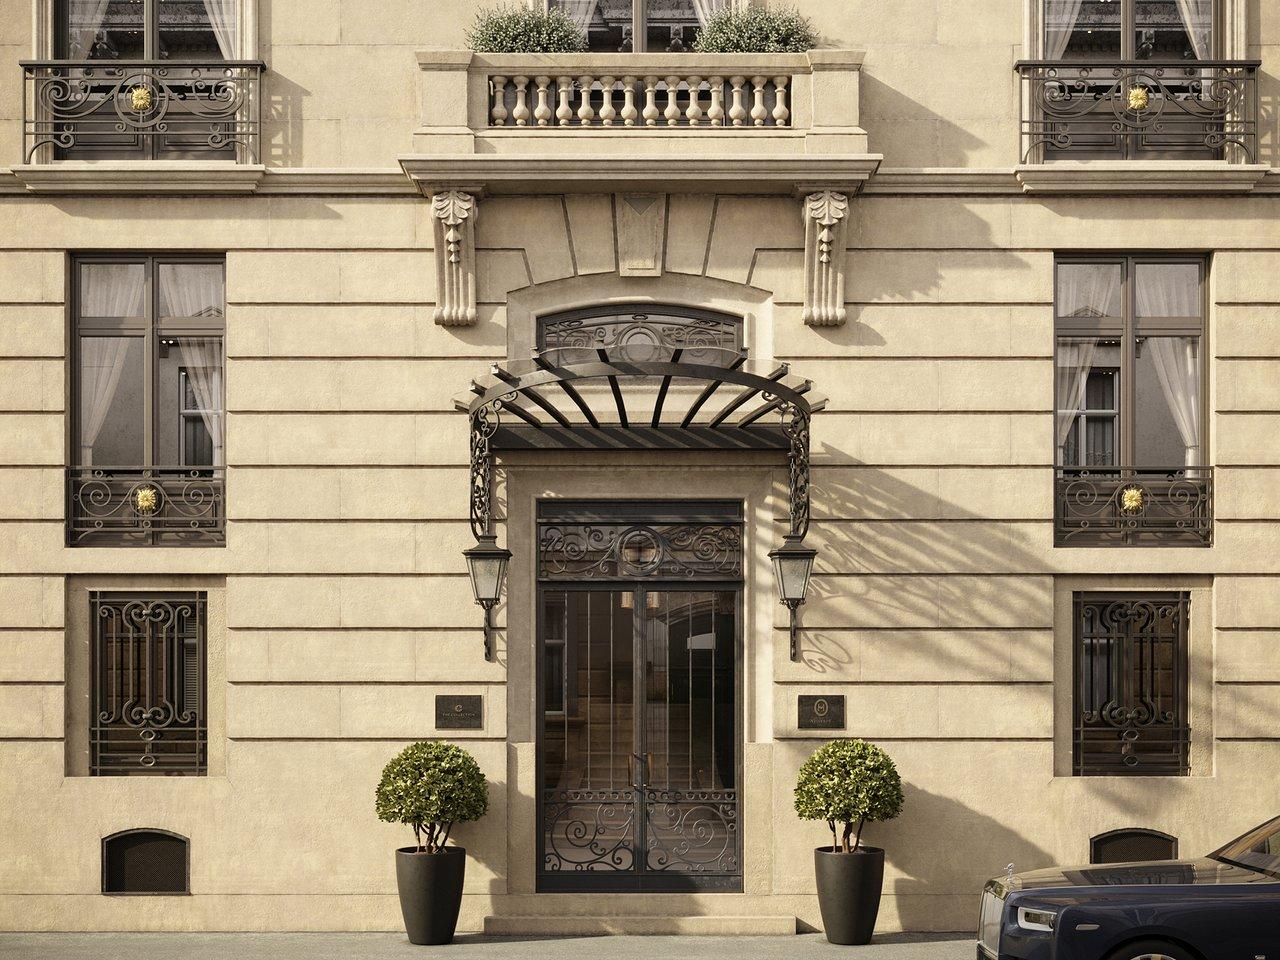 L'Hotel Particulier Villeroy, Paris facade